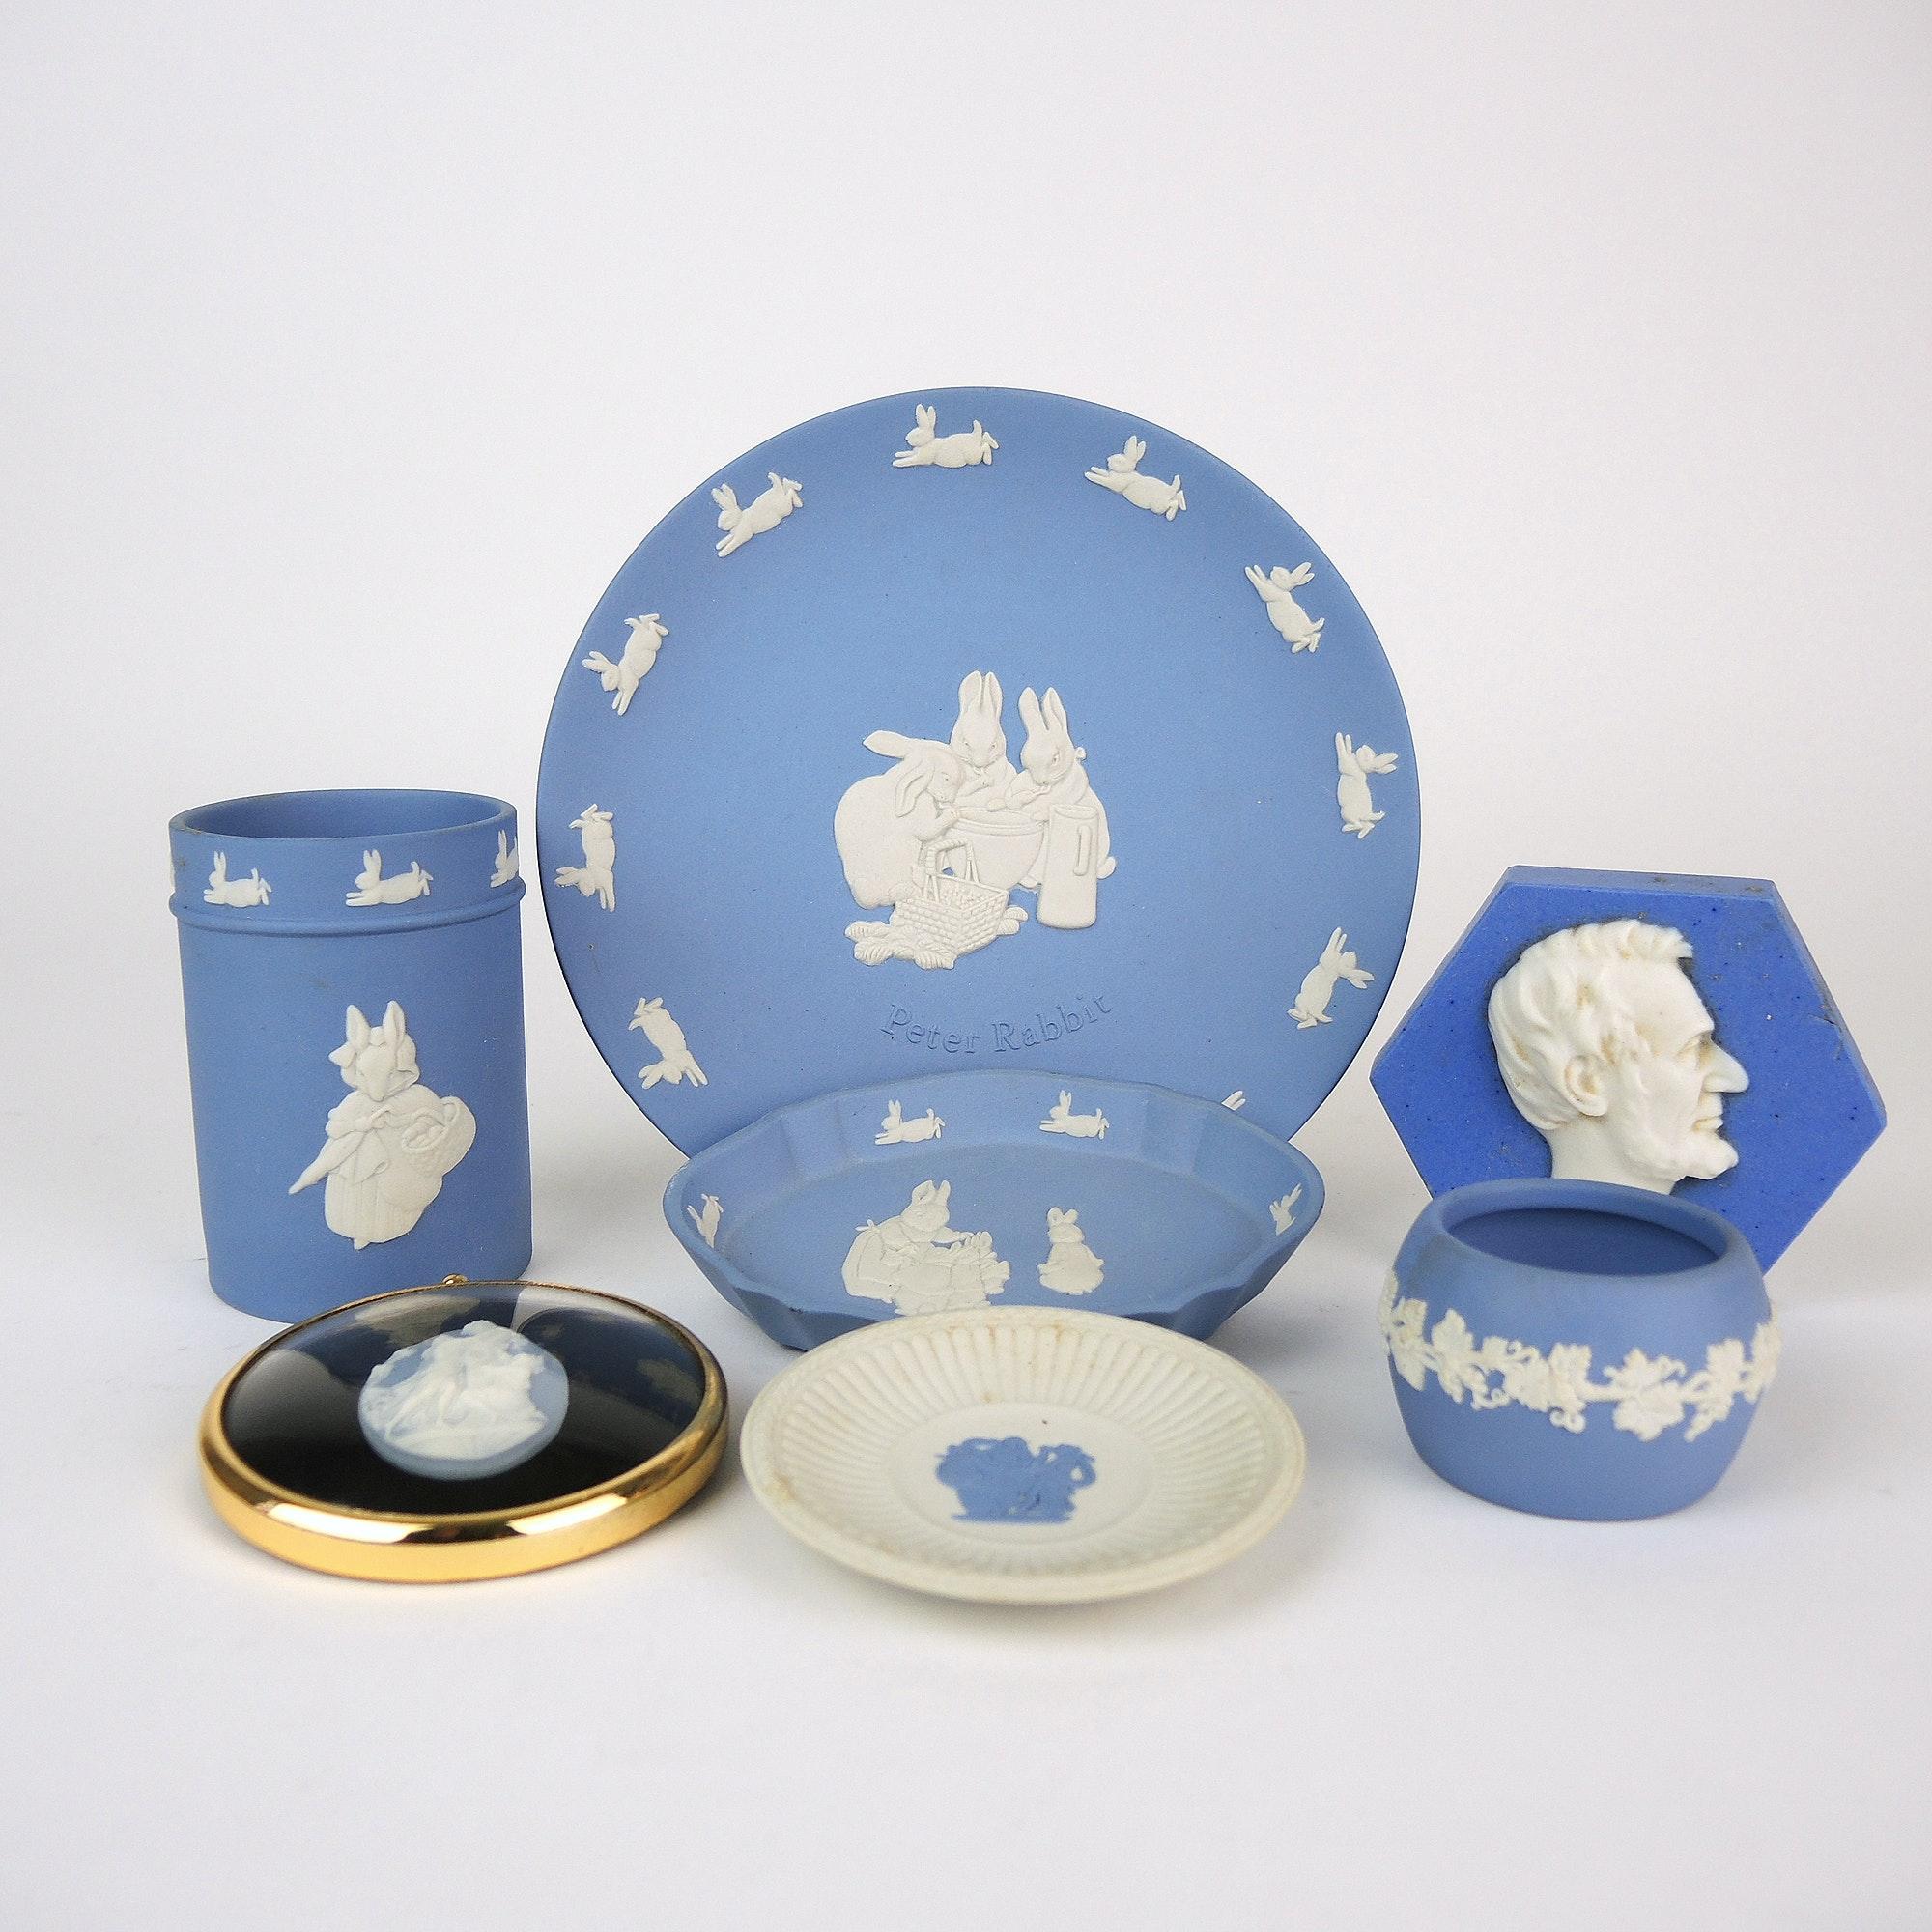 Wedgwood Blue Jasperware Pieces